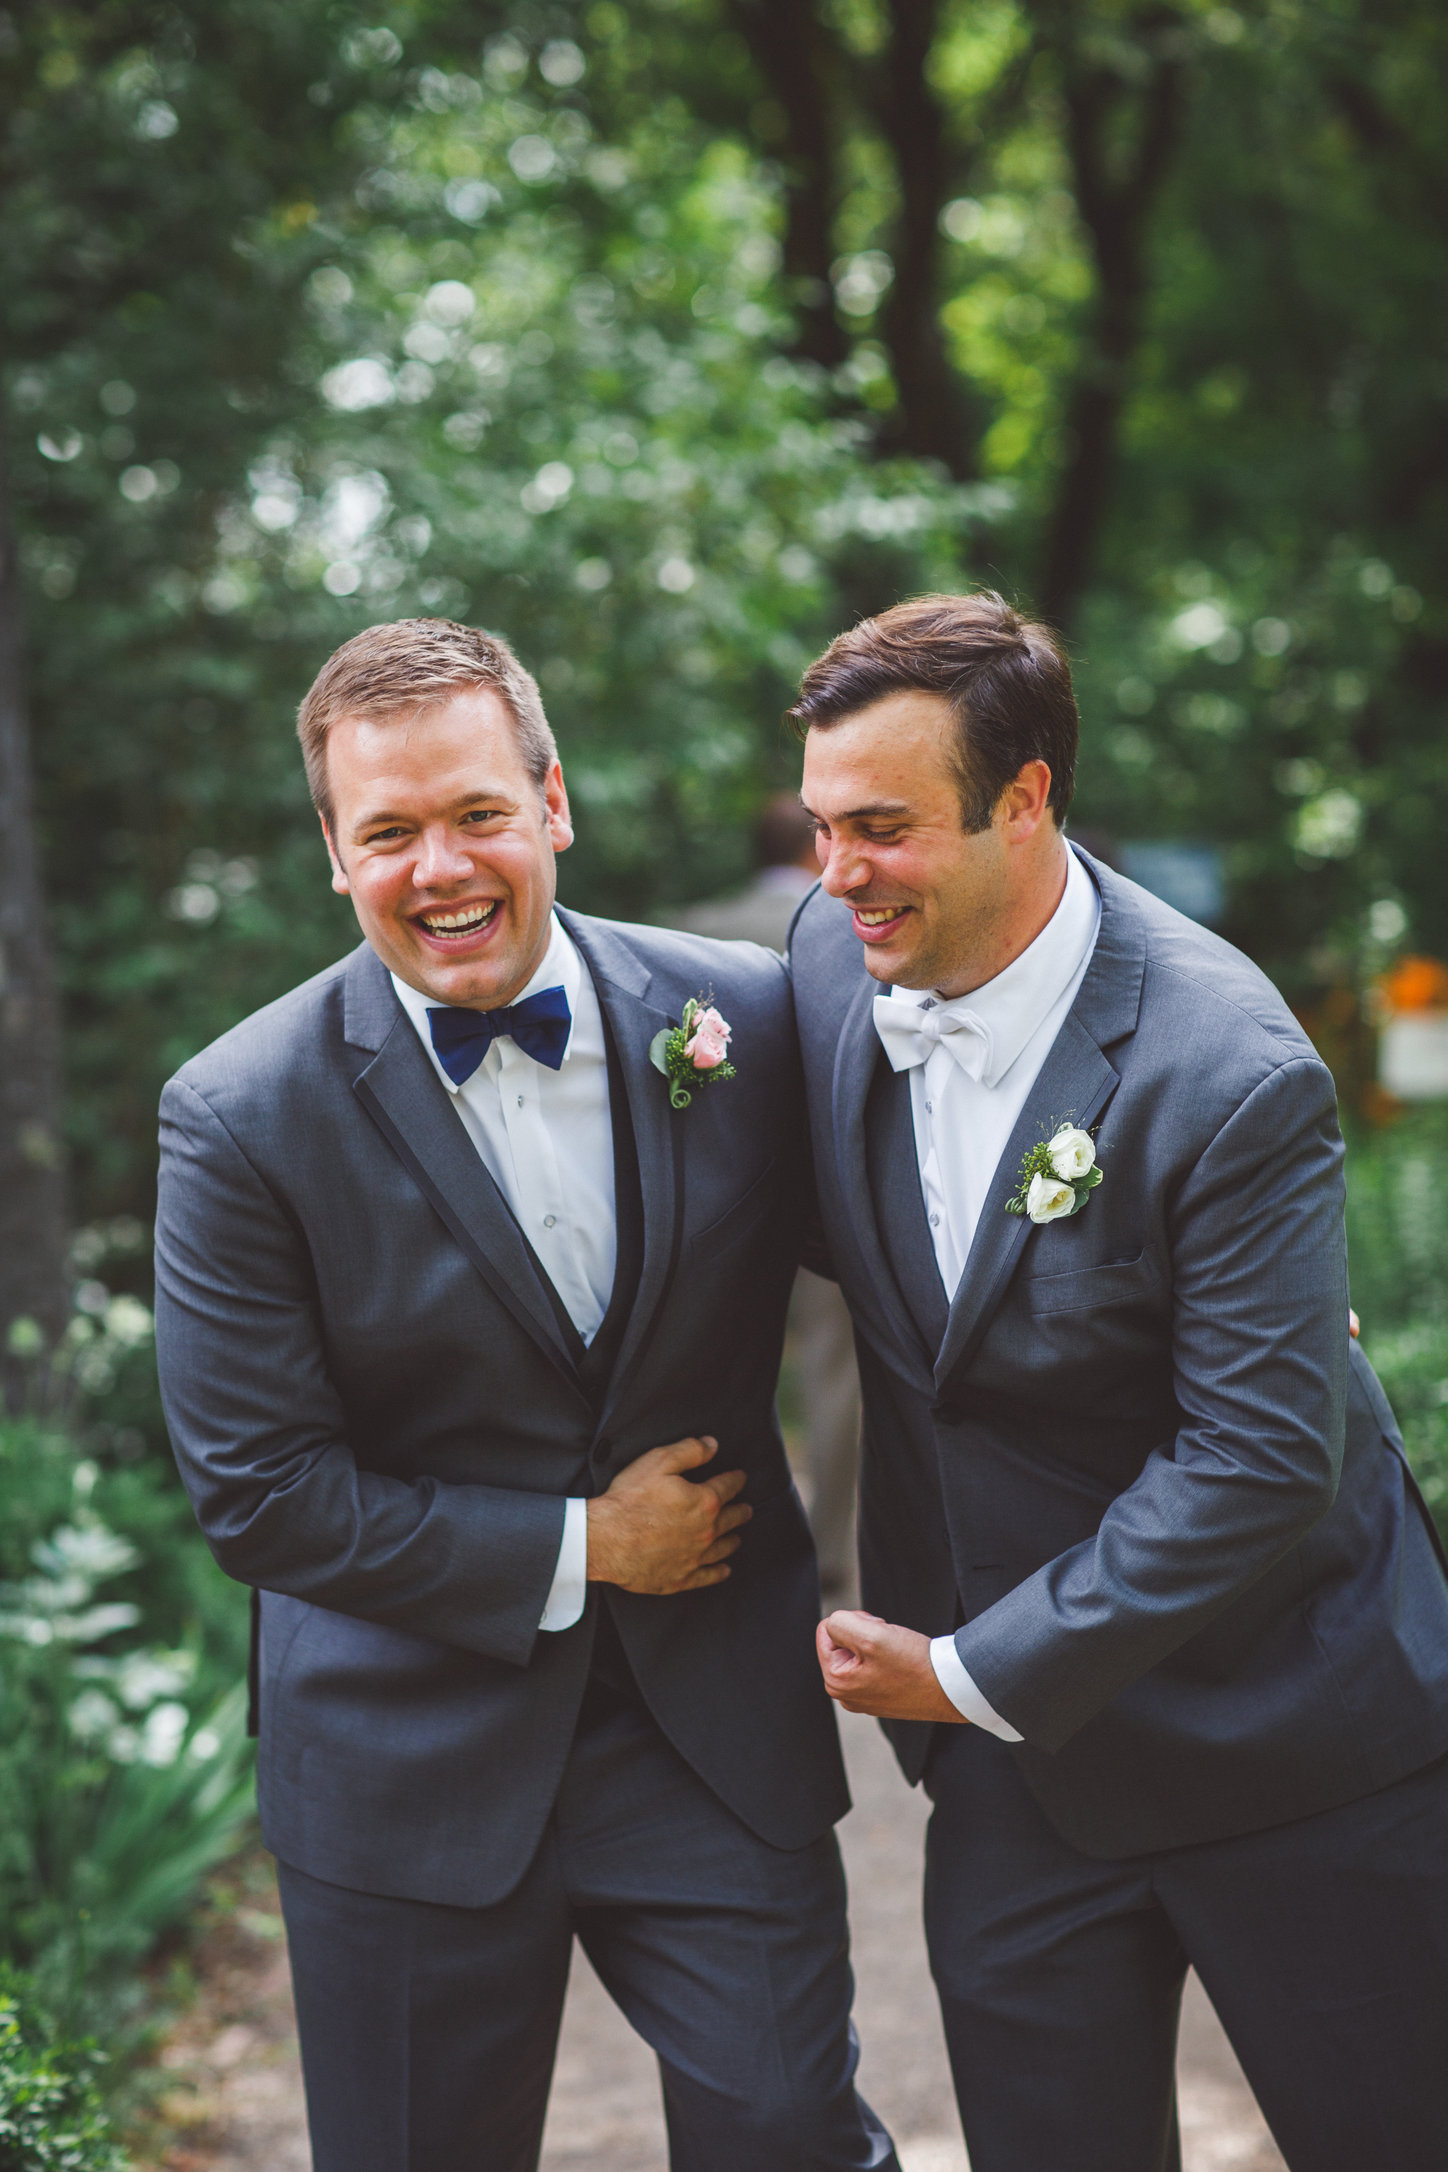 SandC-wedding-358.jpg